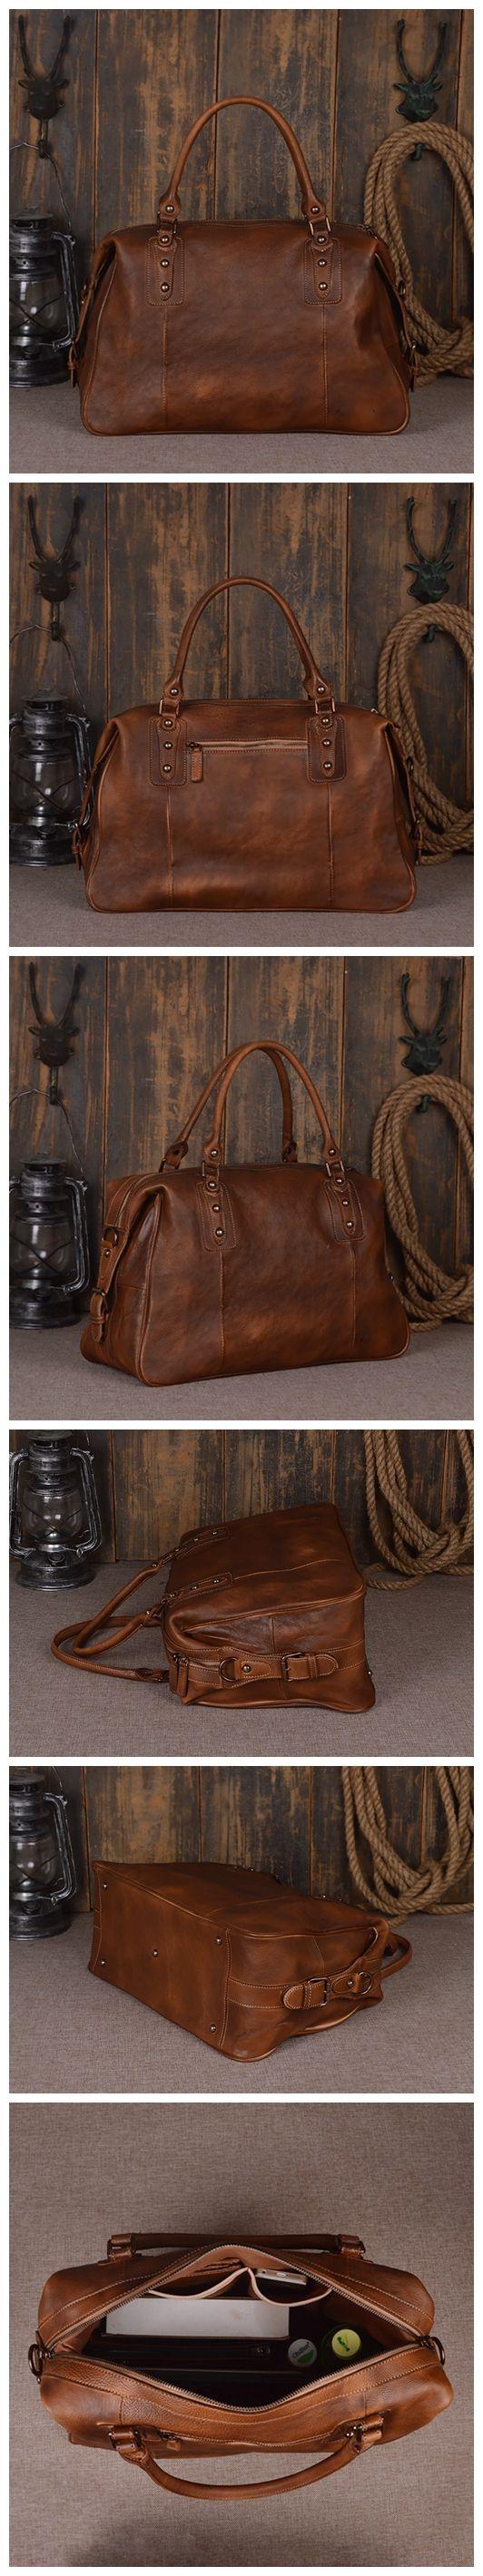 Handmade Full Grain Leather Travel Bag, Leather Duffle Bag, Men Tote Bags, Men's Fashion